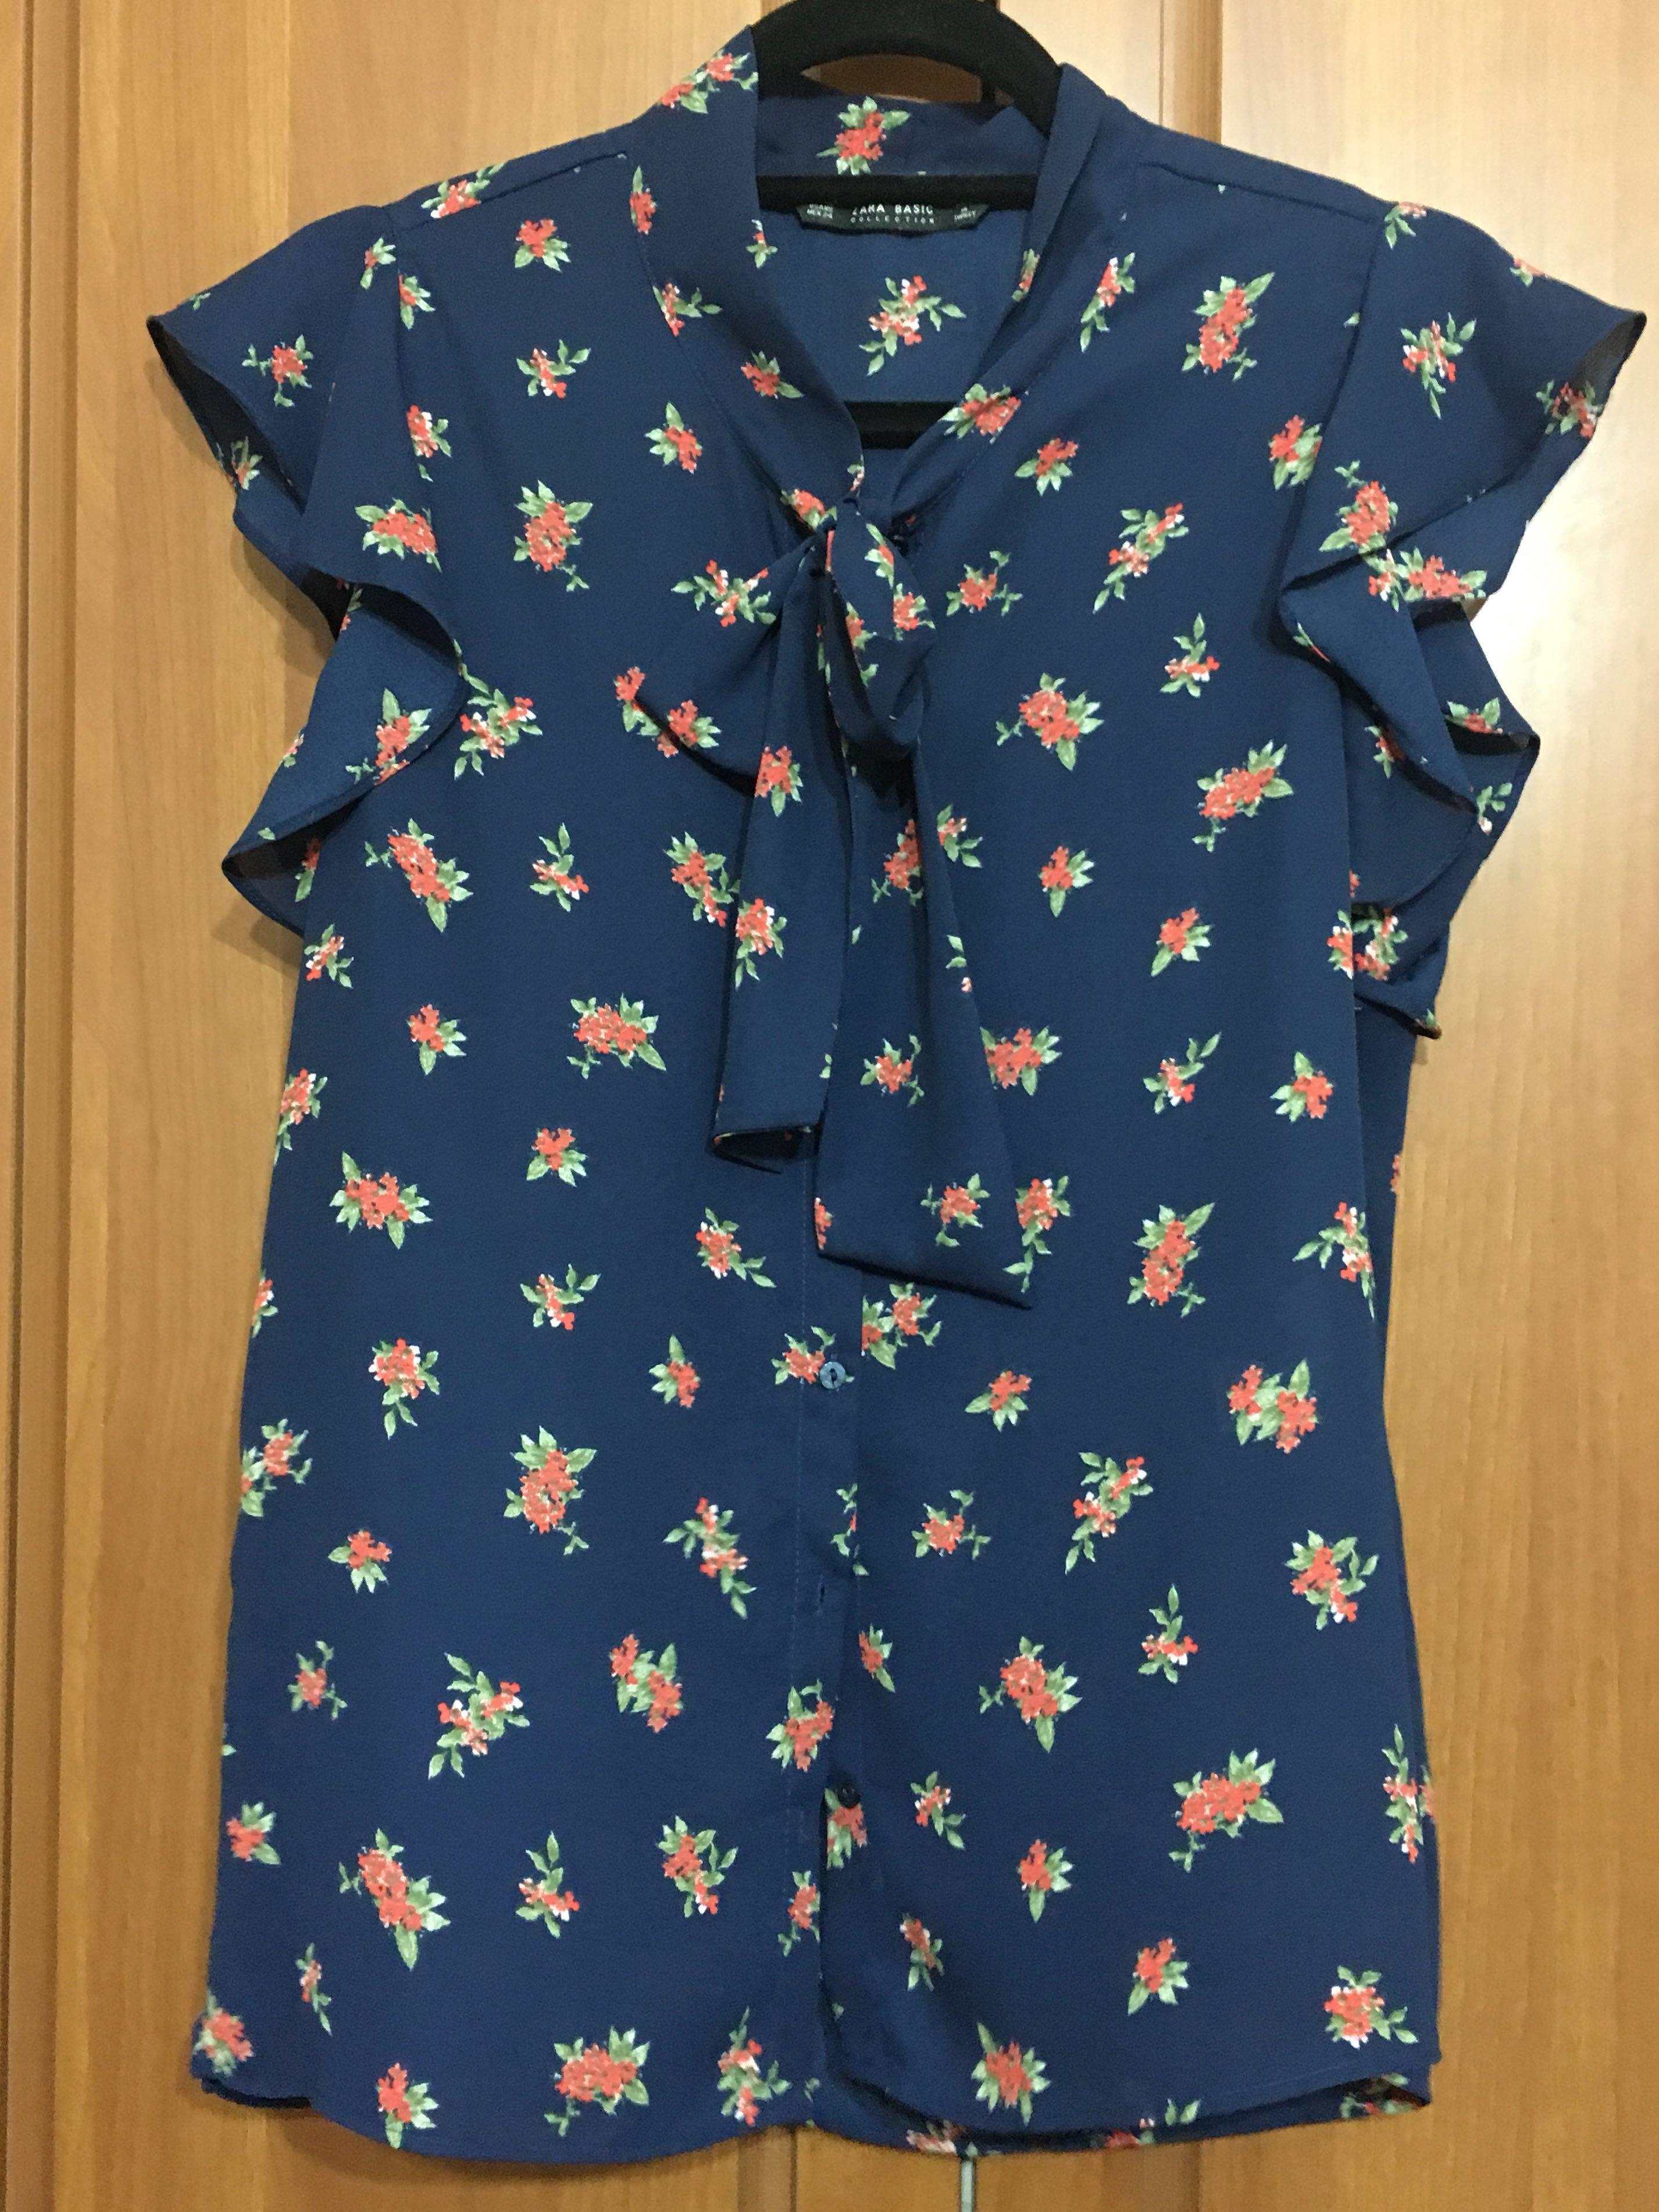 e66dba8a0 Zara floral top, Women's Fashion, Clothes, Tops on Carousell